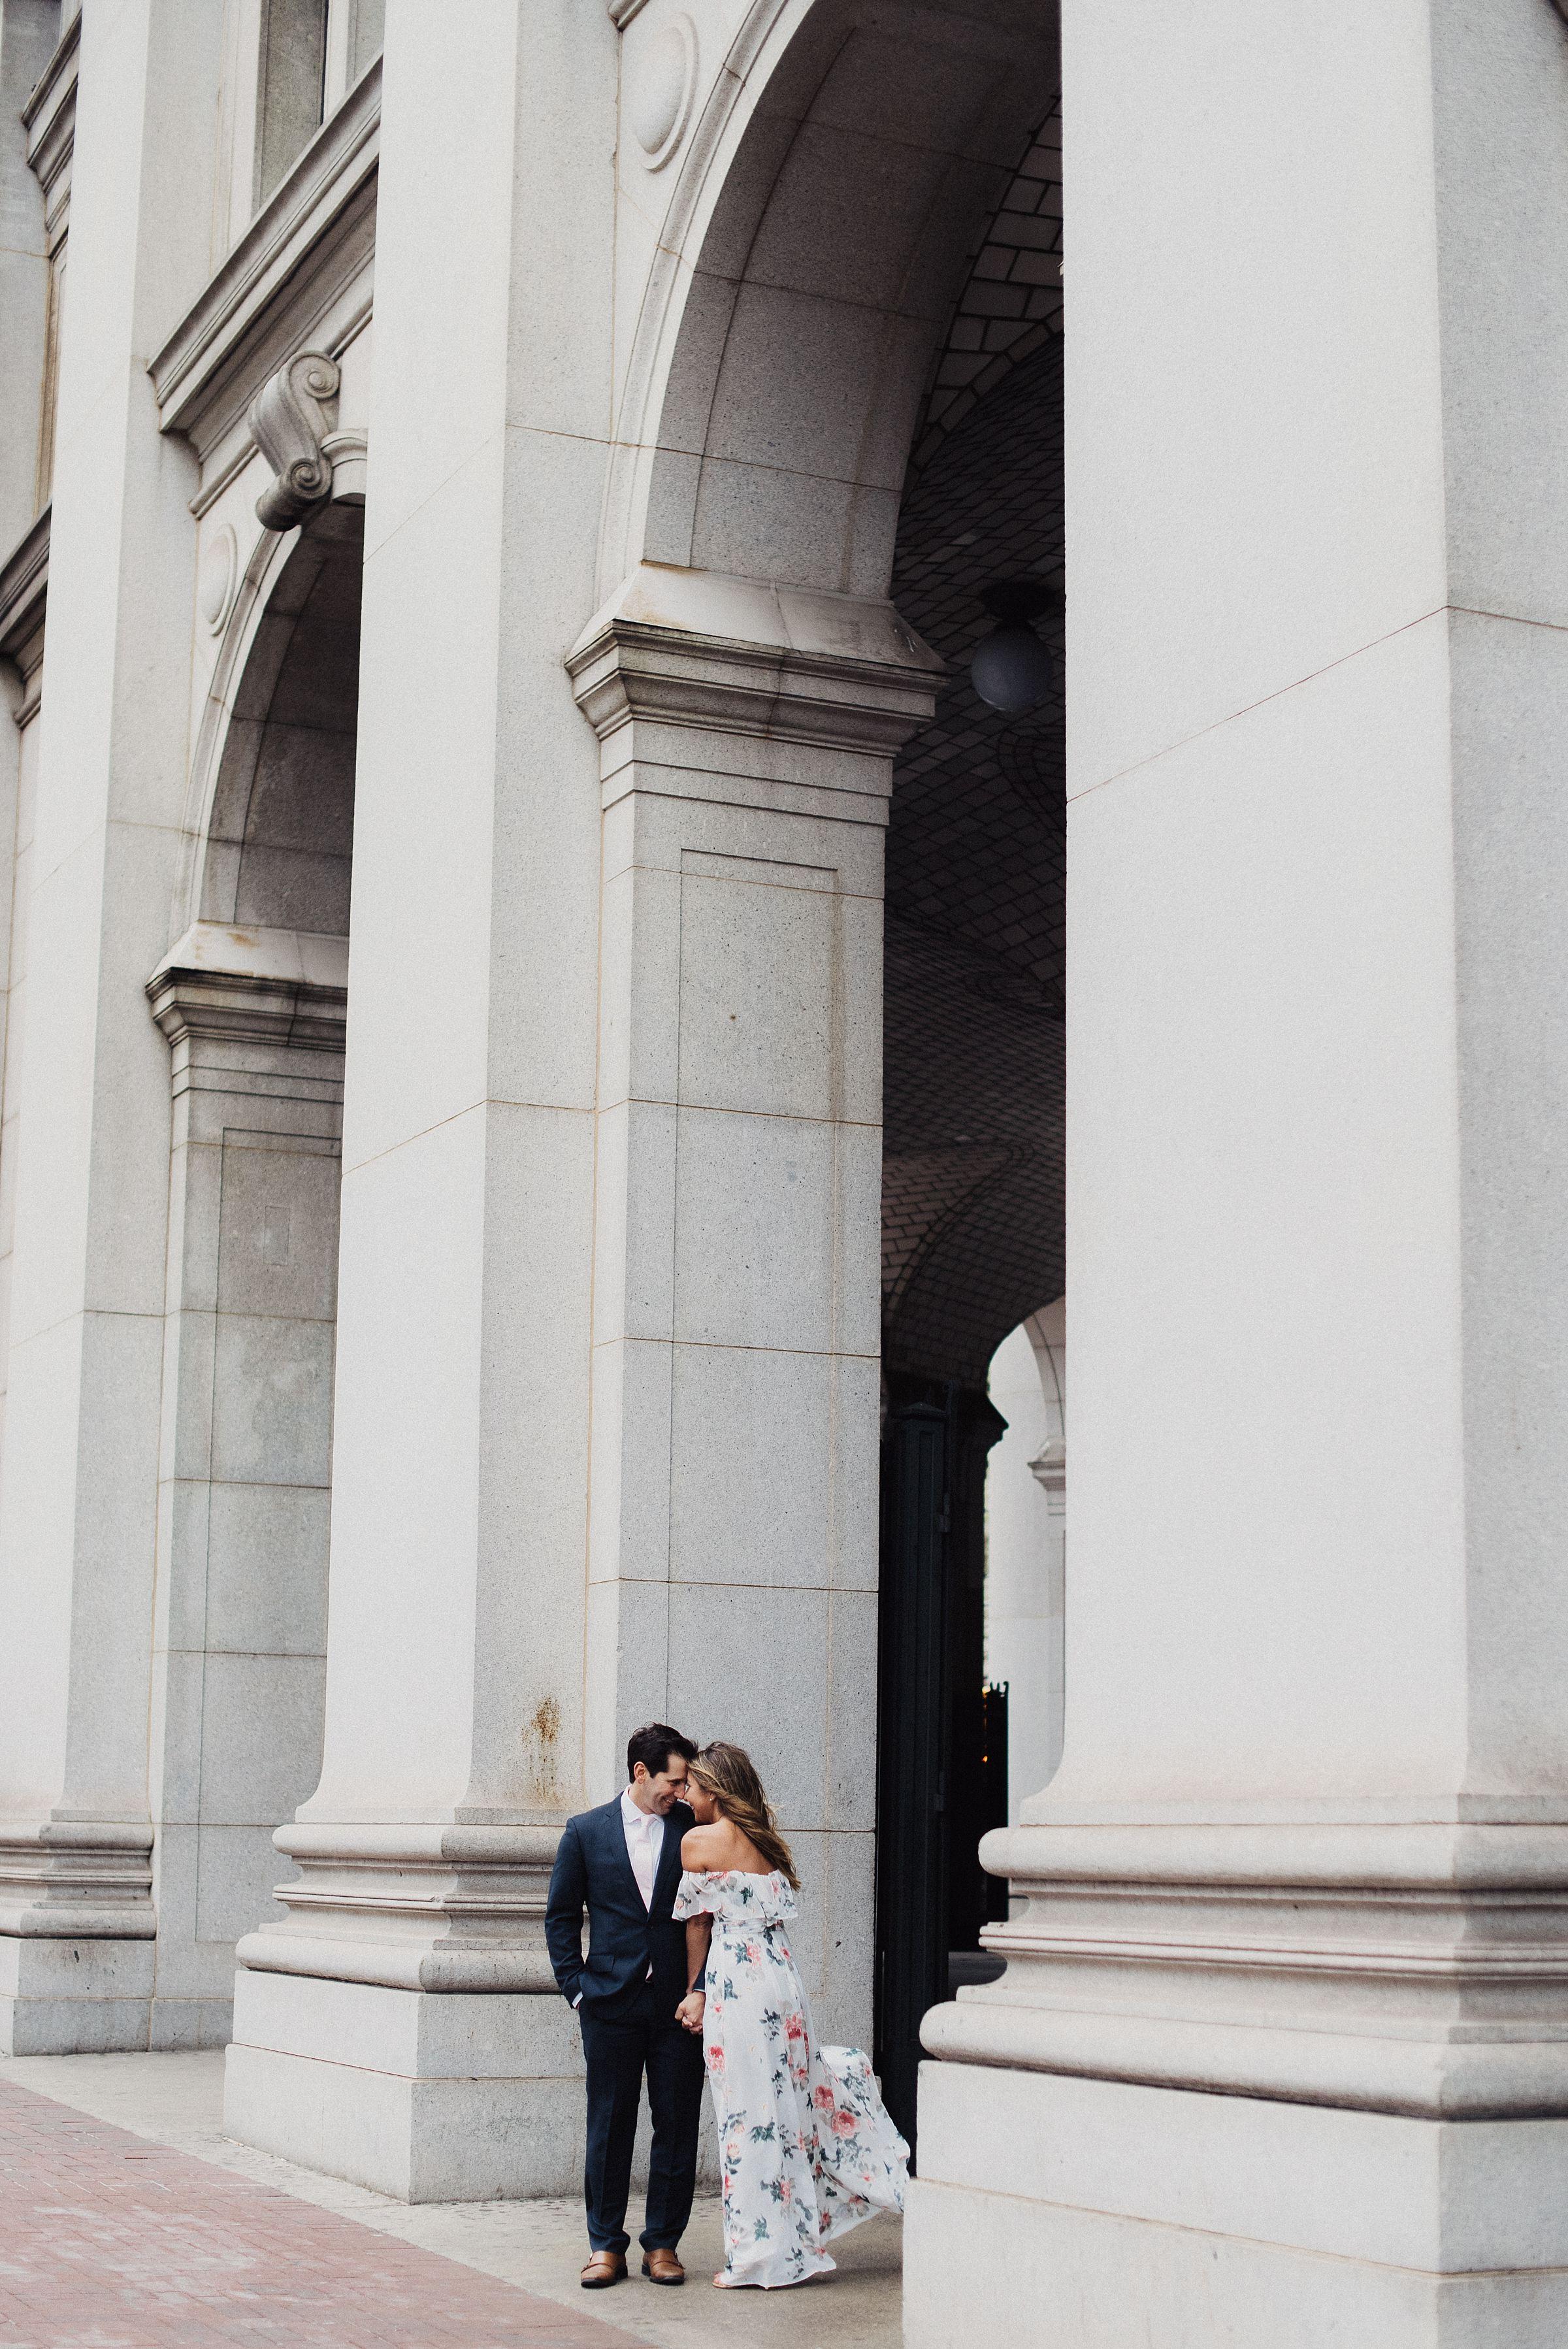 New York City Wedding Photographer Eden Strader